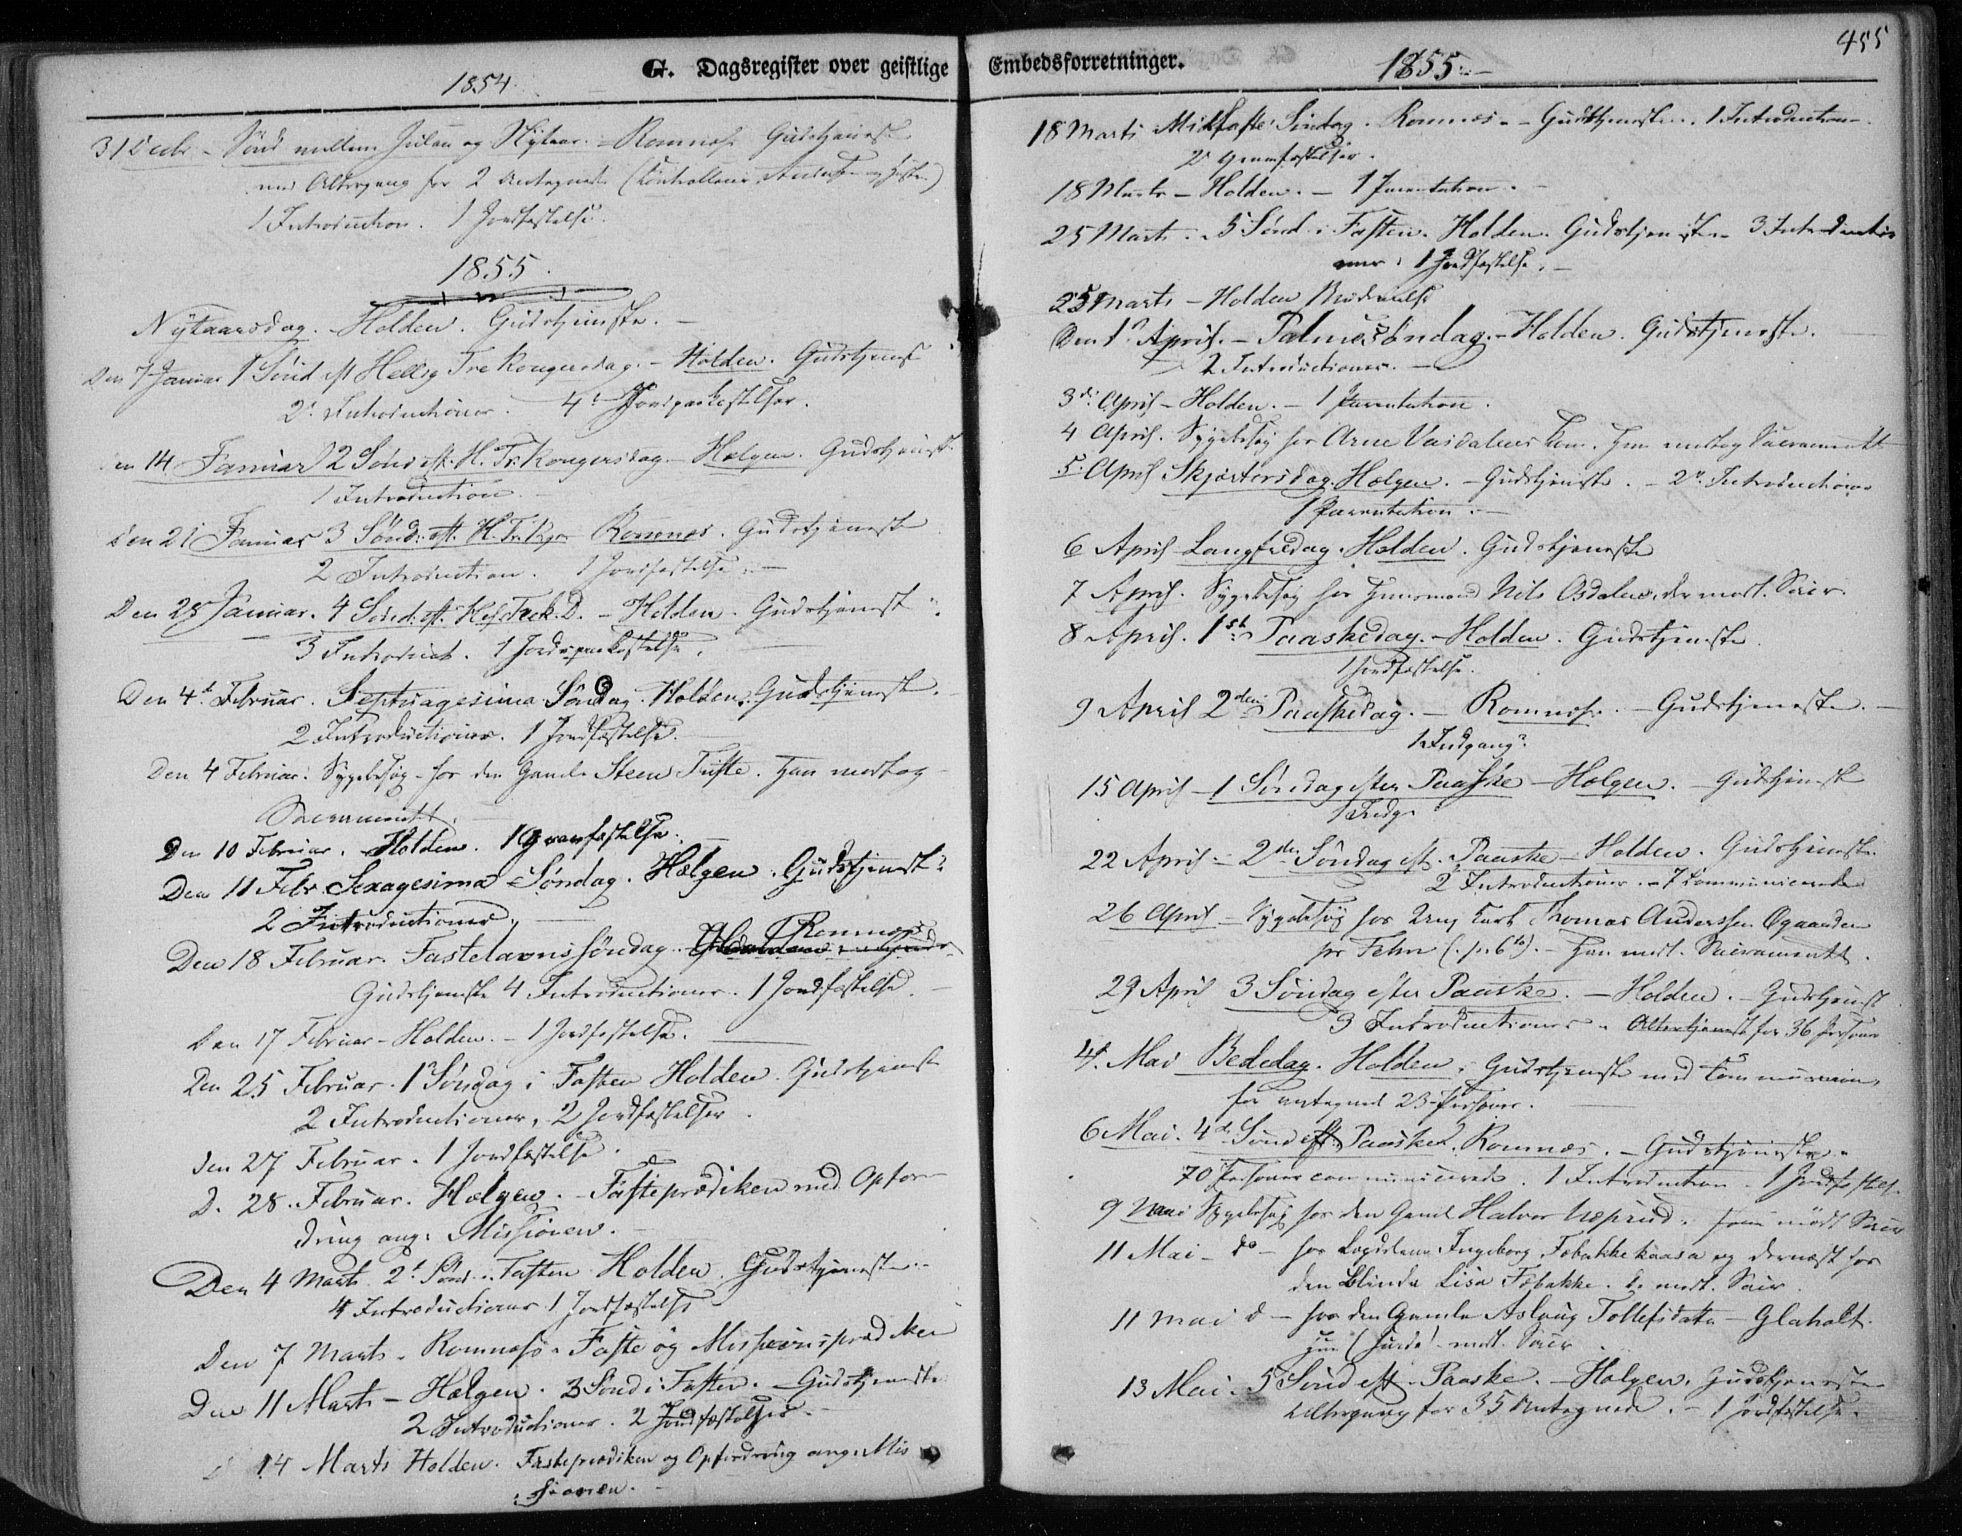 SAKO, Holla kirkebøker, F/Fa/L0005: Ministerialbok nr. 5, 1849-1860, s. 455